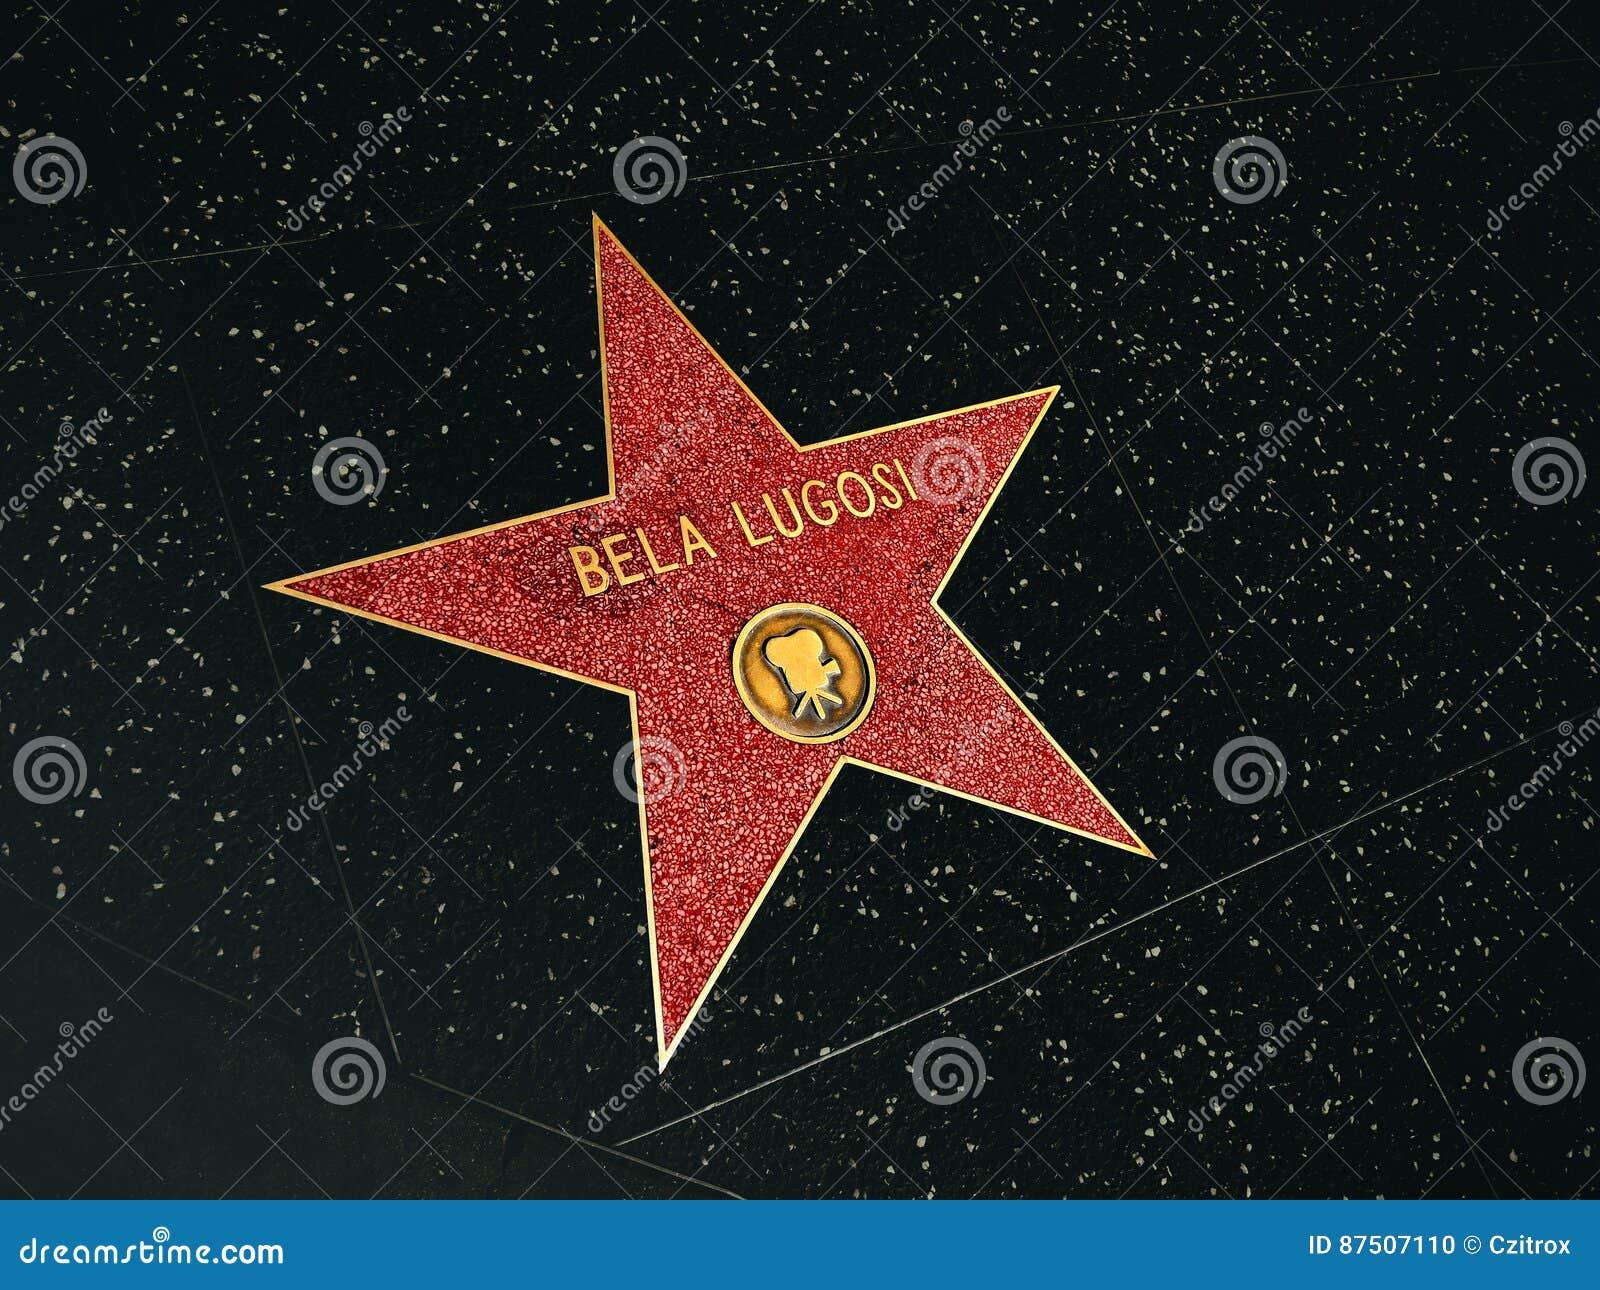 Promenade de la renommée, Bela Lugosi